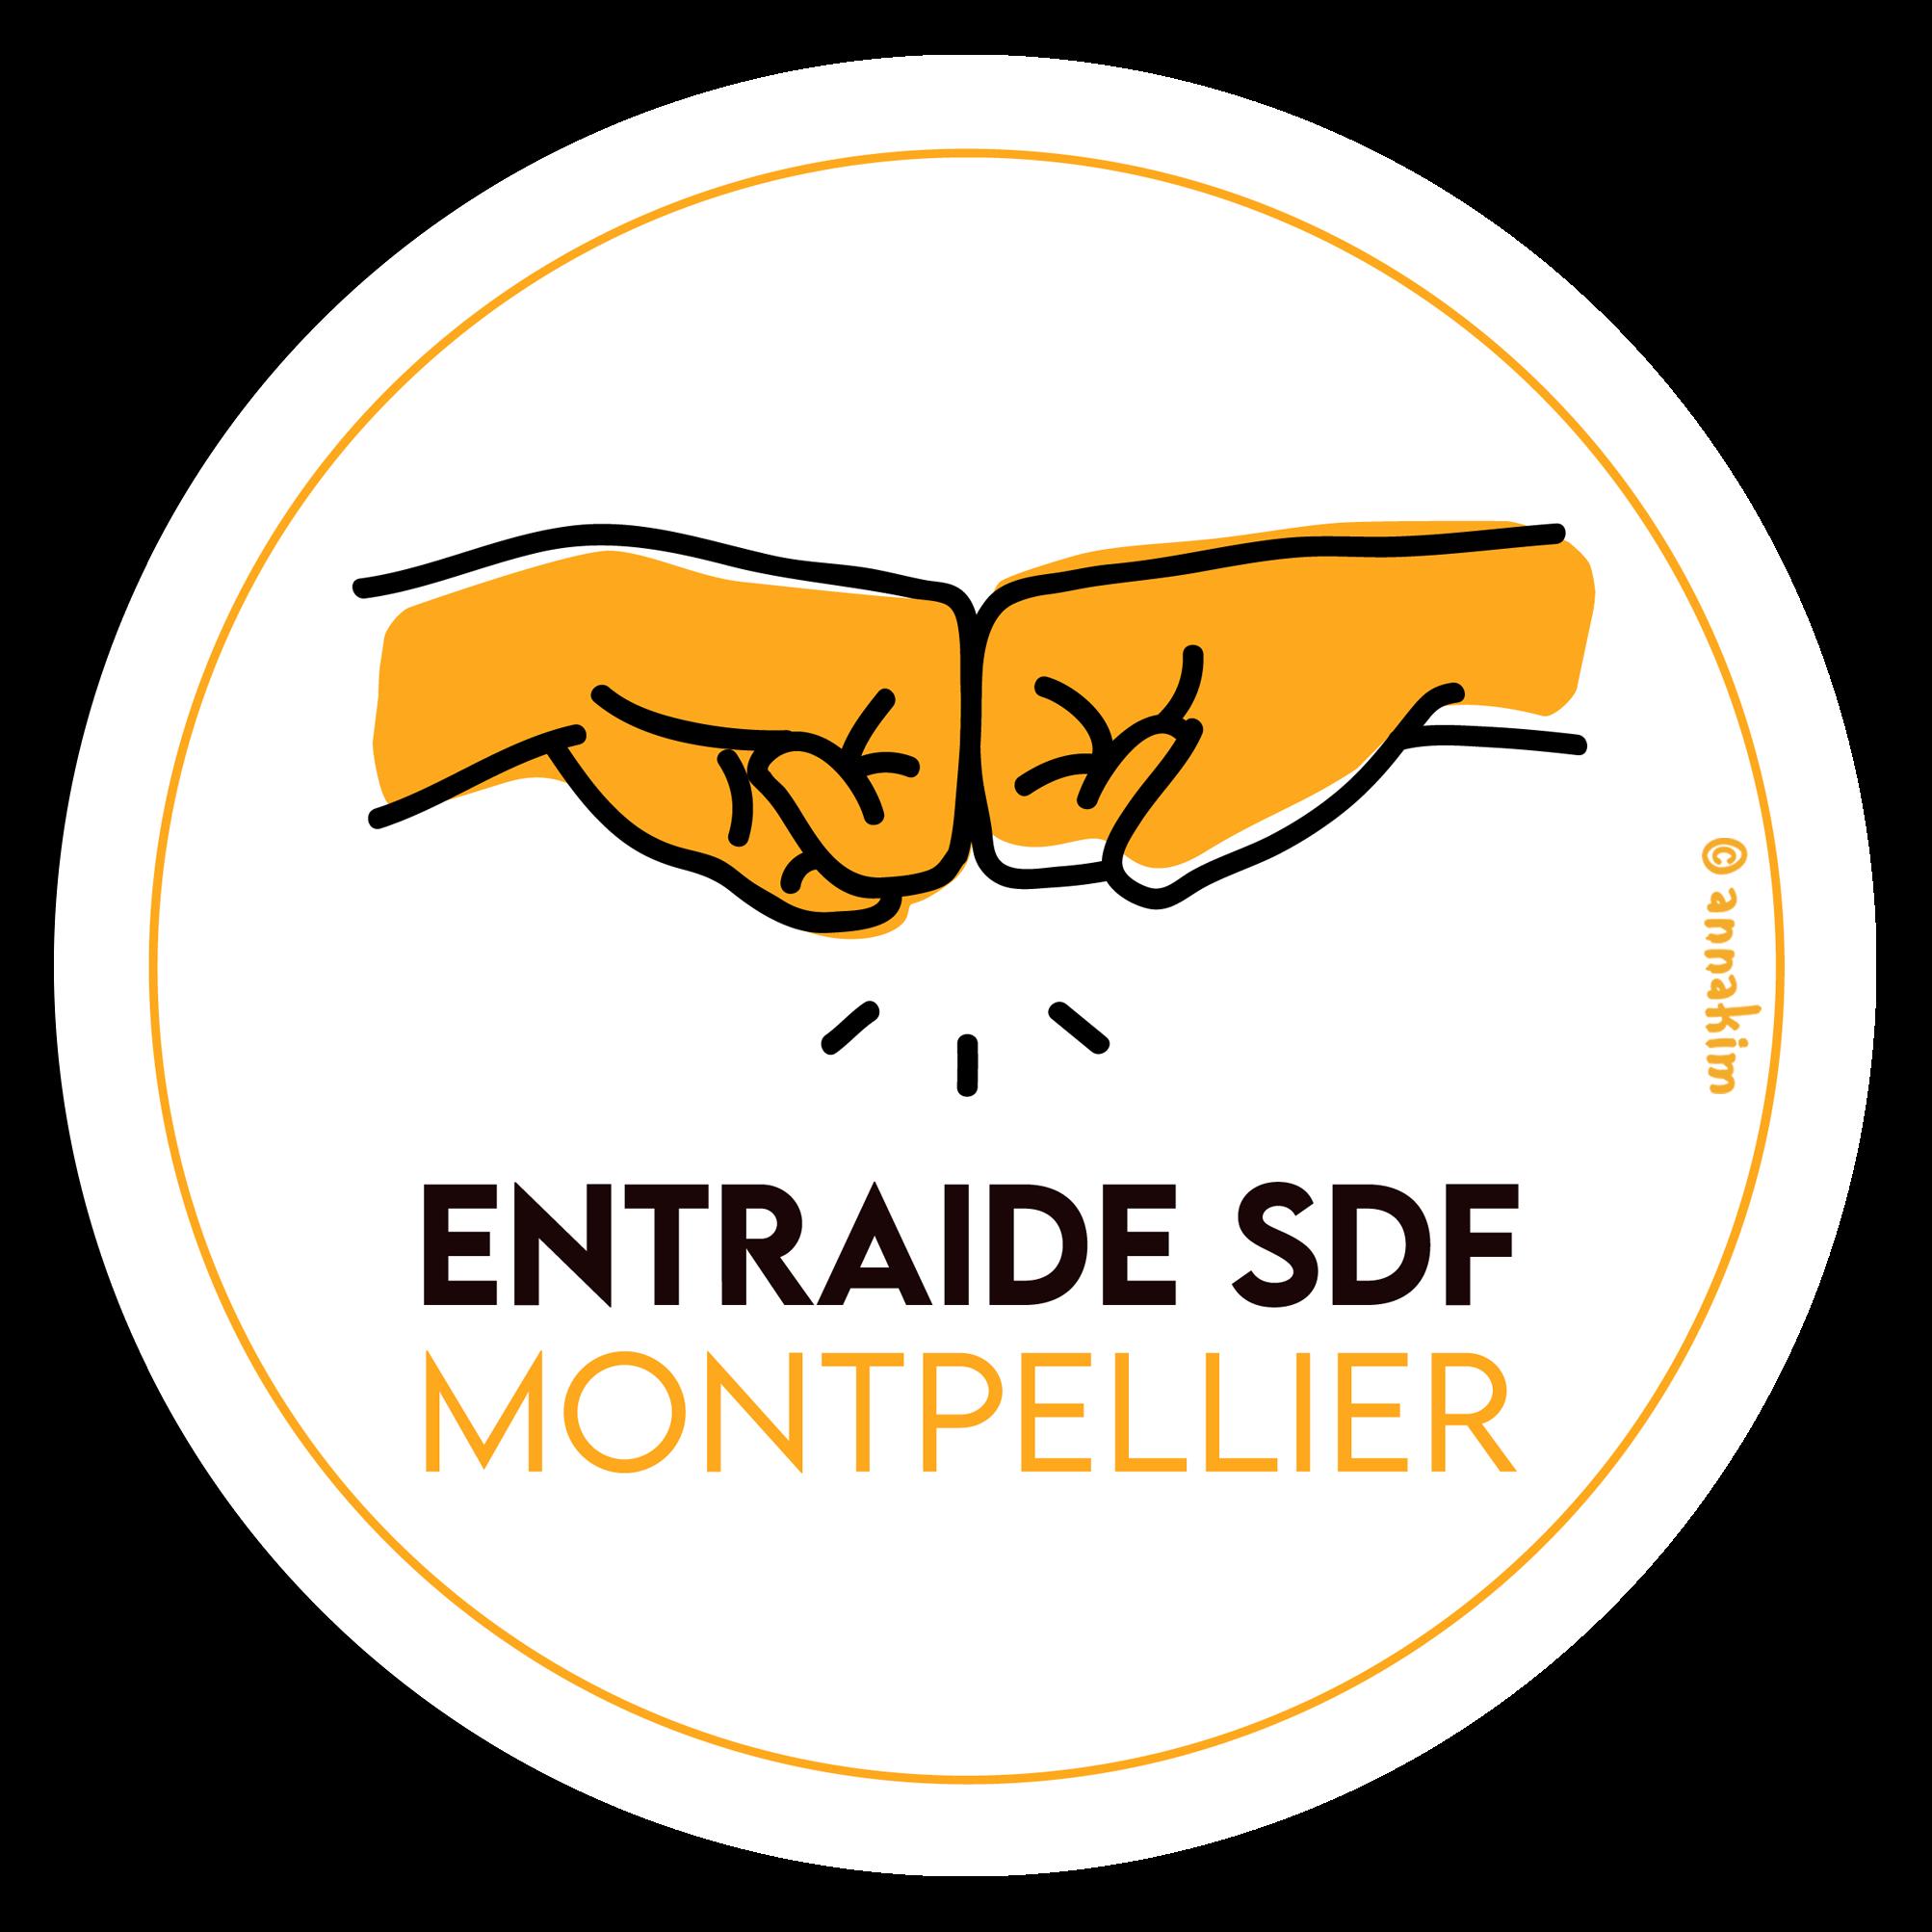 Entraide SDF Montpellier